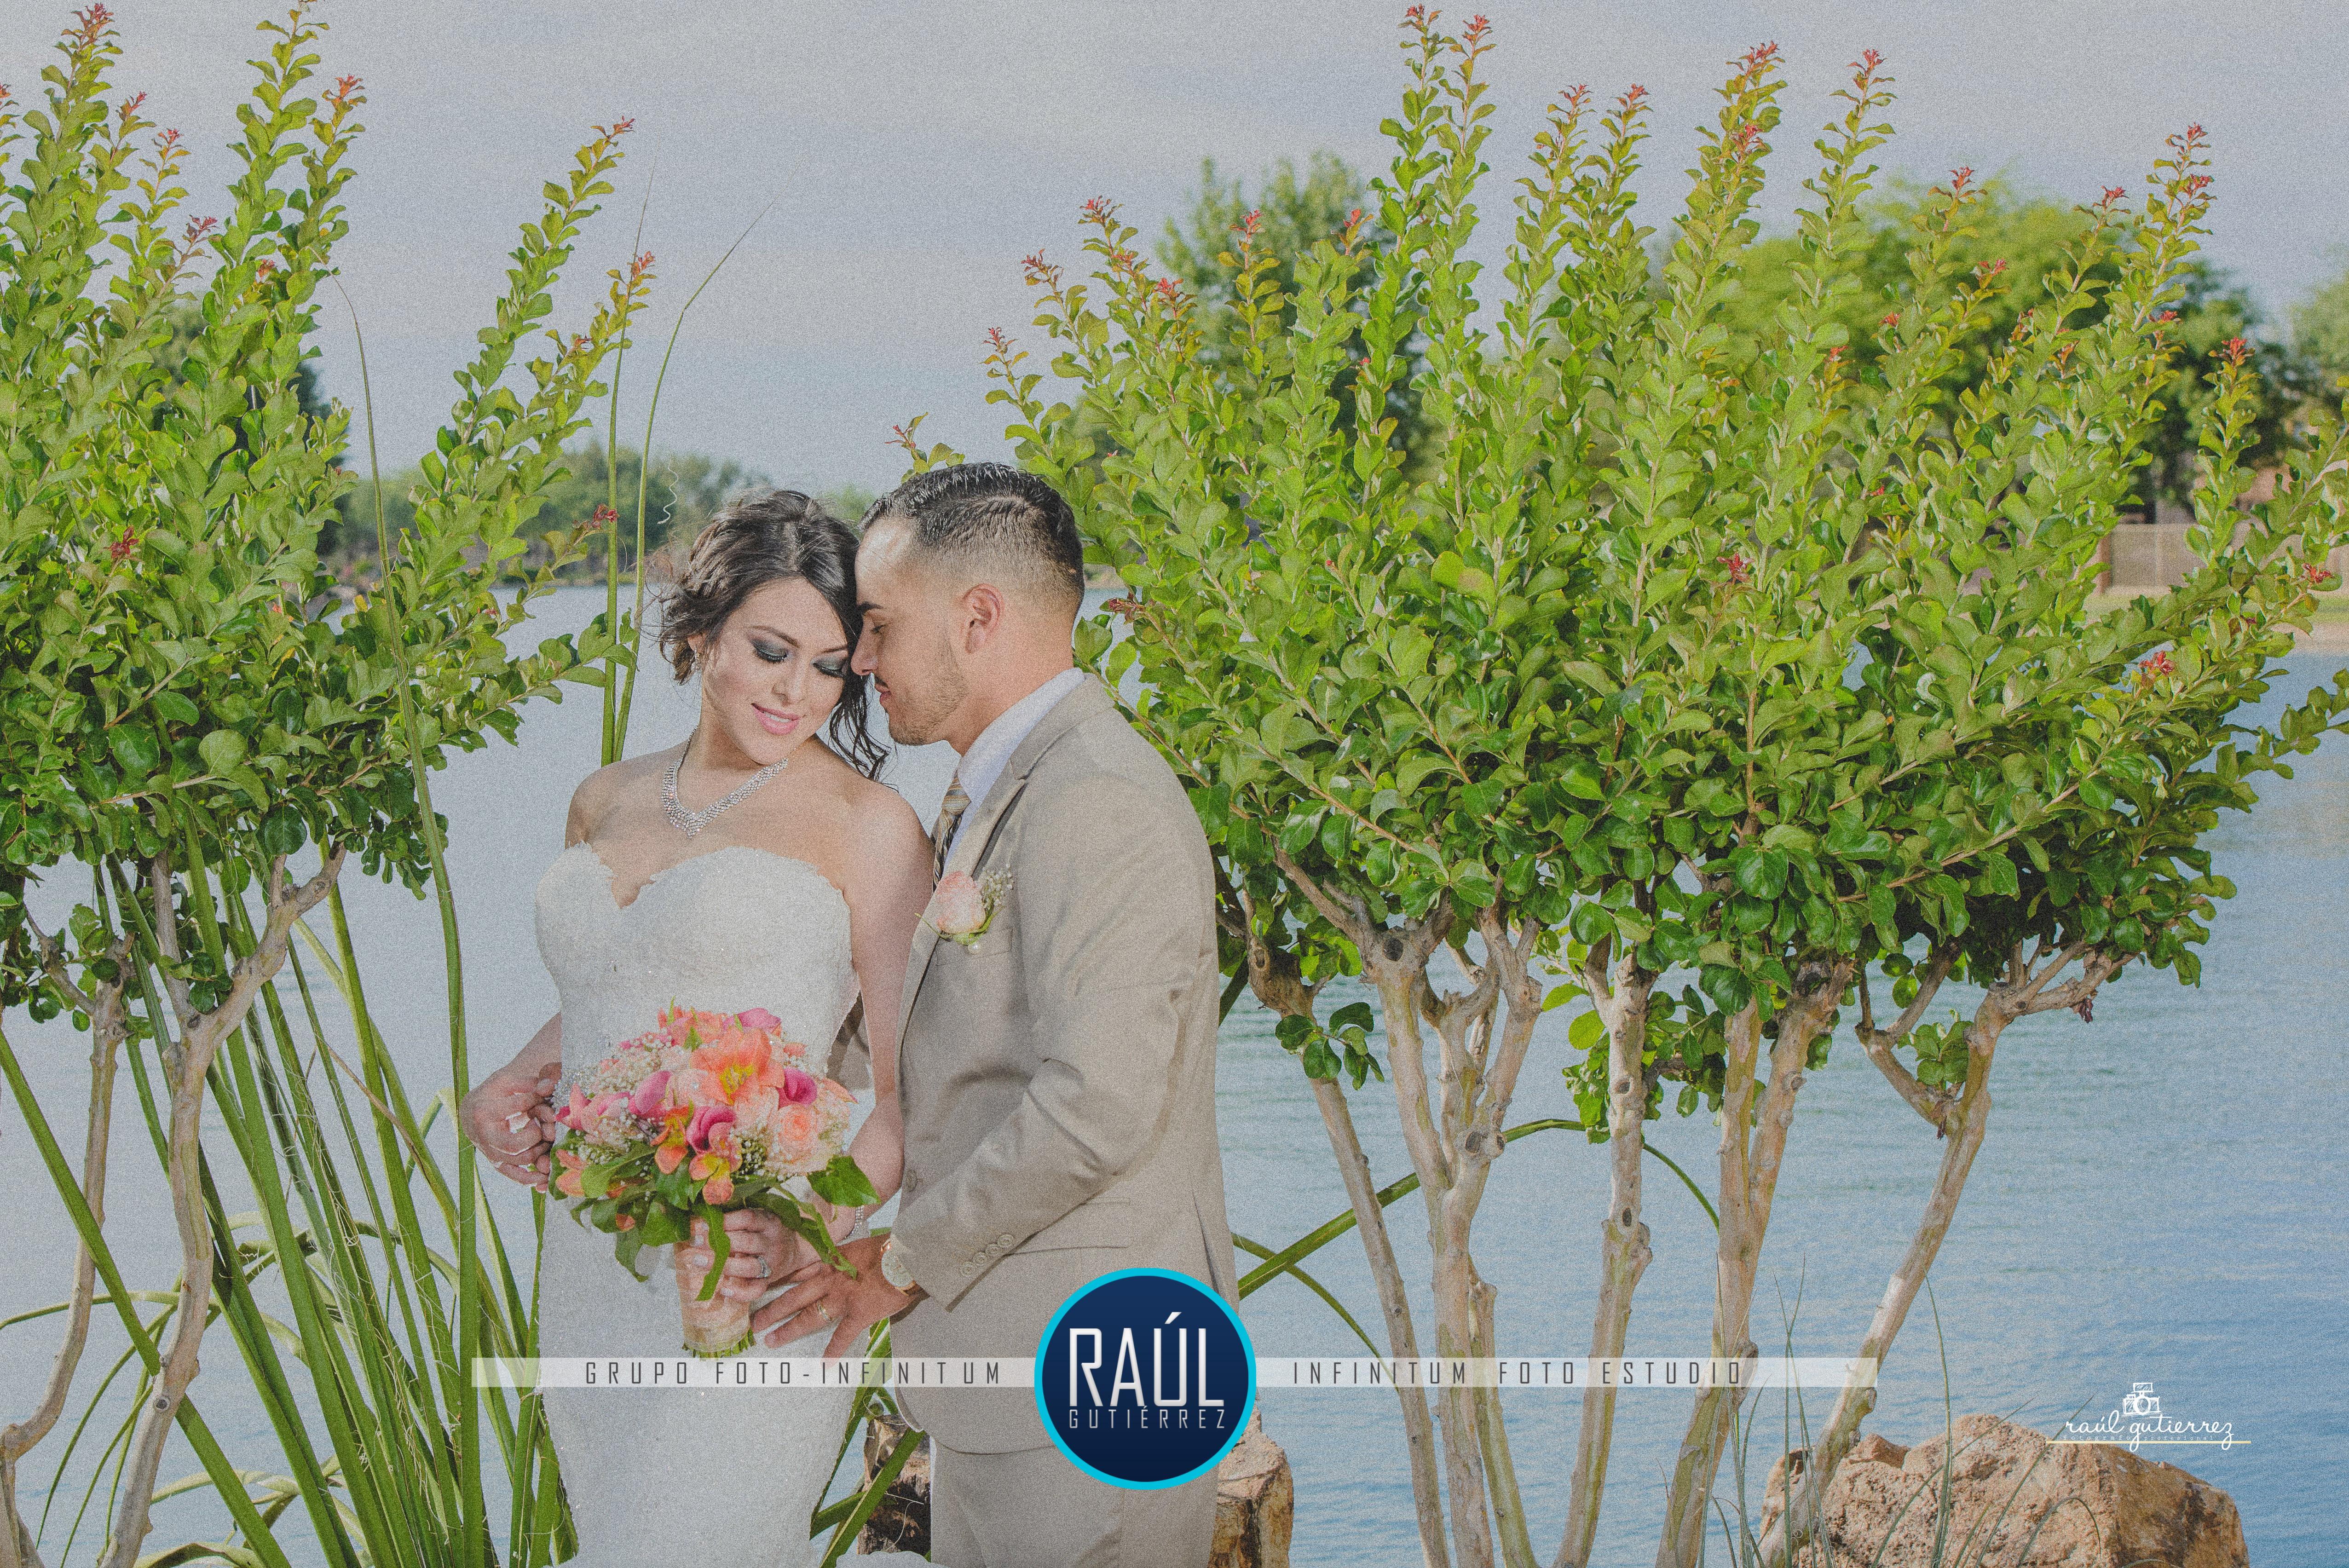 sesion de boda 210516 (55)f